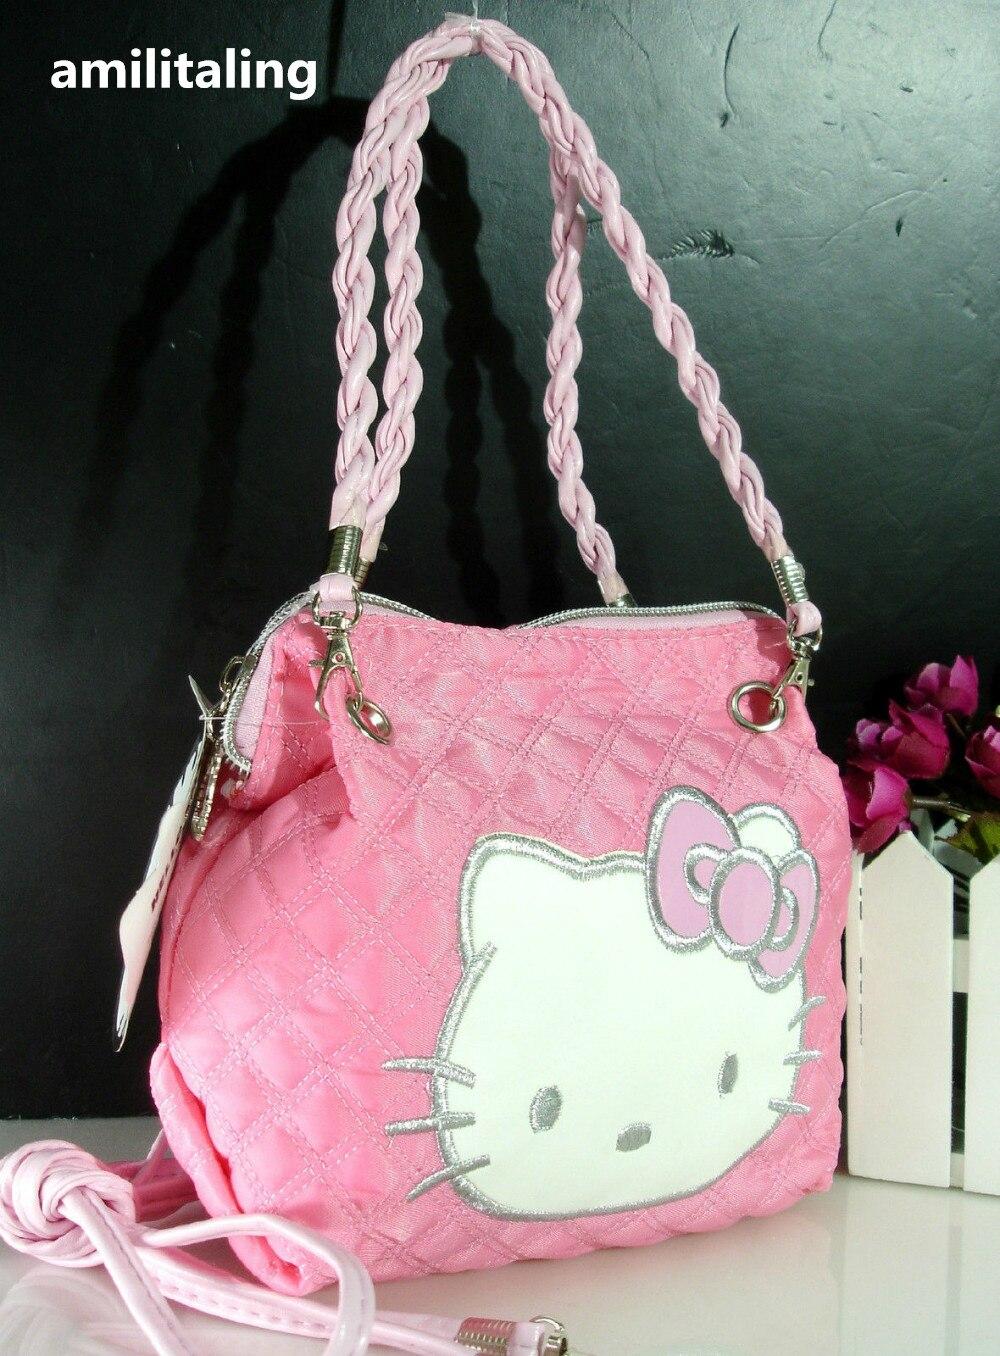 New Hello kitty Mini Bag with Shoulder Strap Bag Purse. YE-6692P 7054eda12f